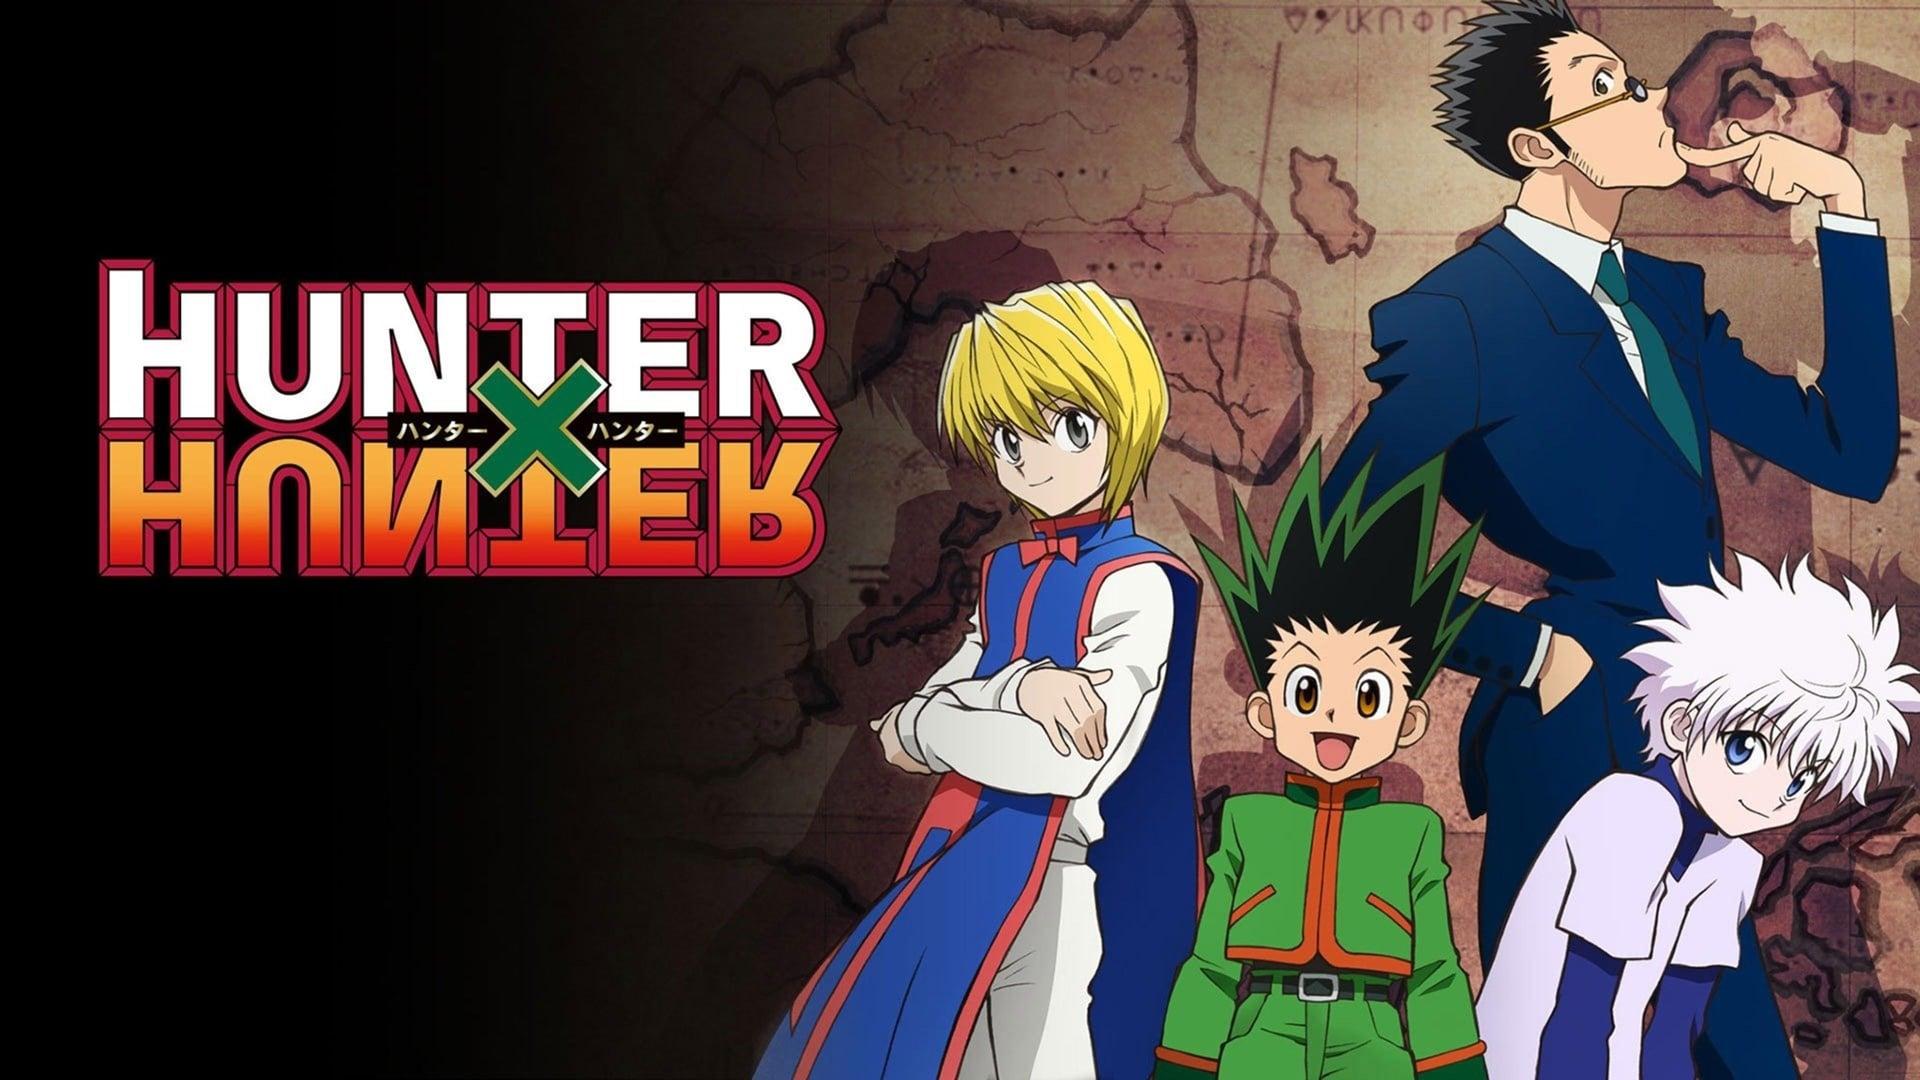 Hunter x Hunter - Season 2 Episode 4